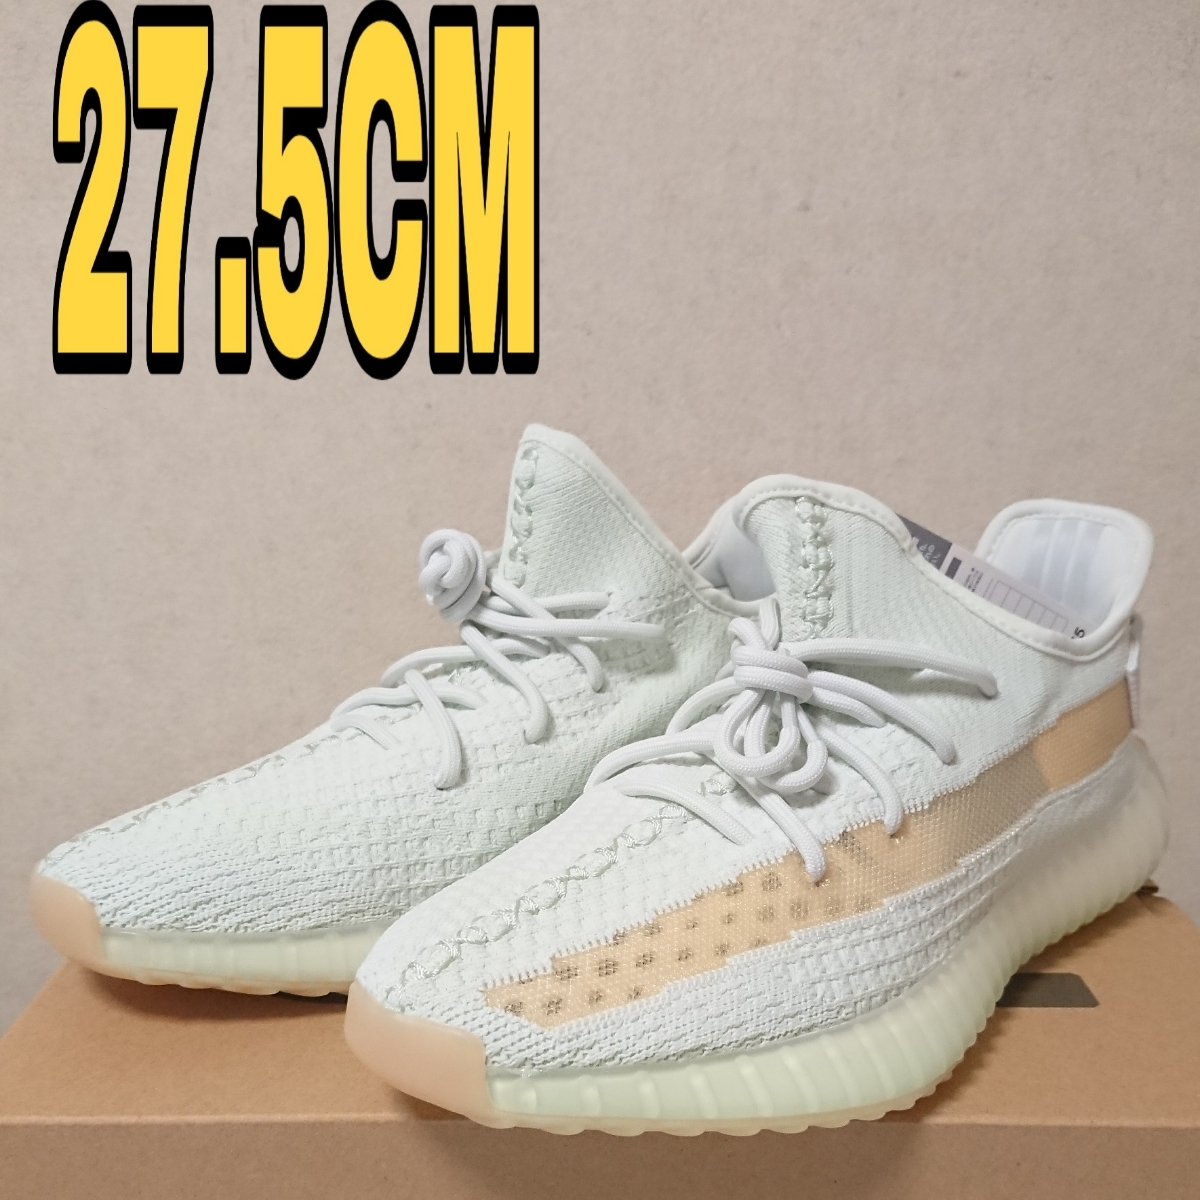 livraison gratuite e92b1 585e4 Adidas Easy boost 350V2 7 hyper Space : Real Yahoo auction ...